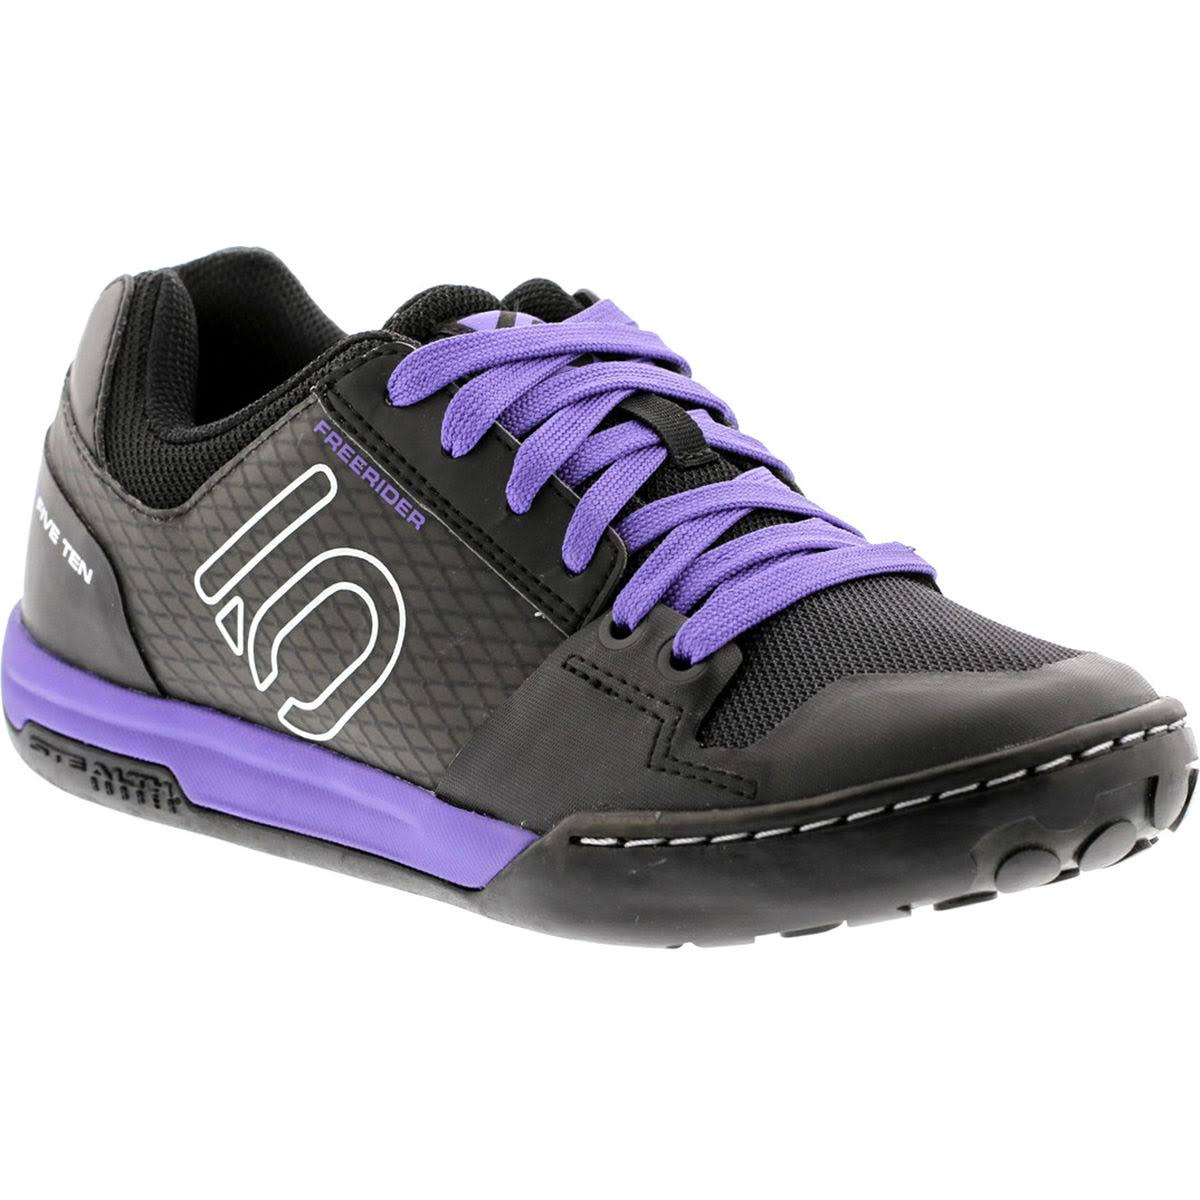 Mujer Ten Contact Freerider 5 Shoe Purple Five 0 Split AOqgvv